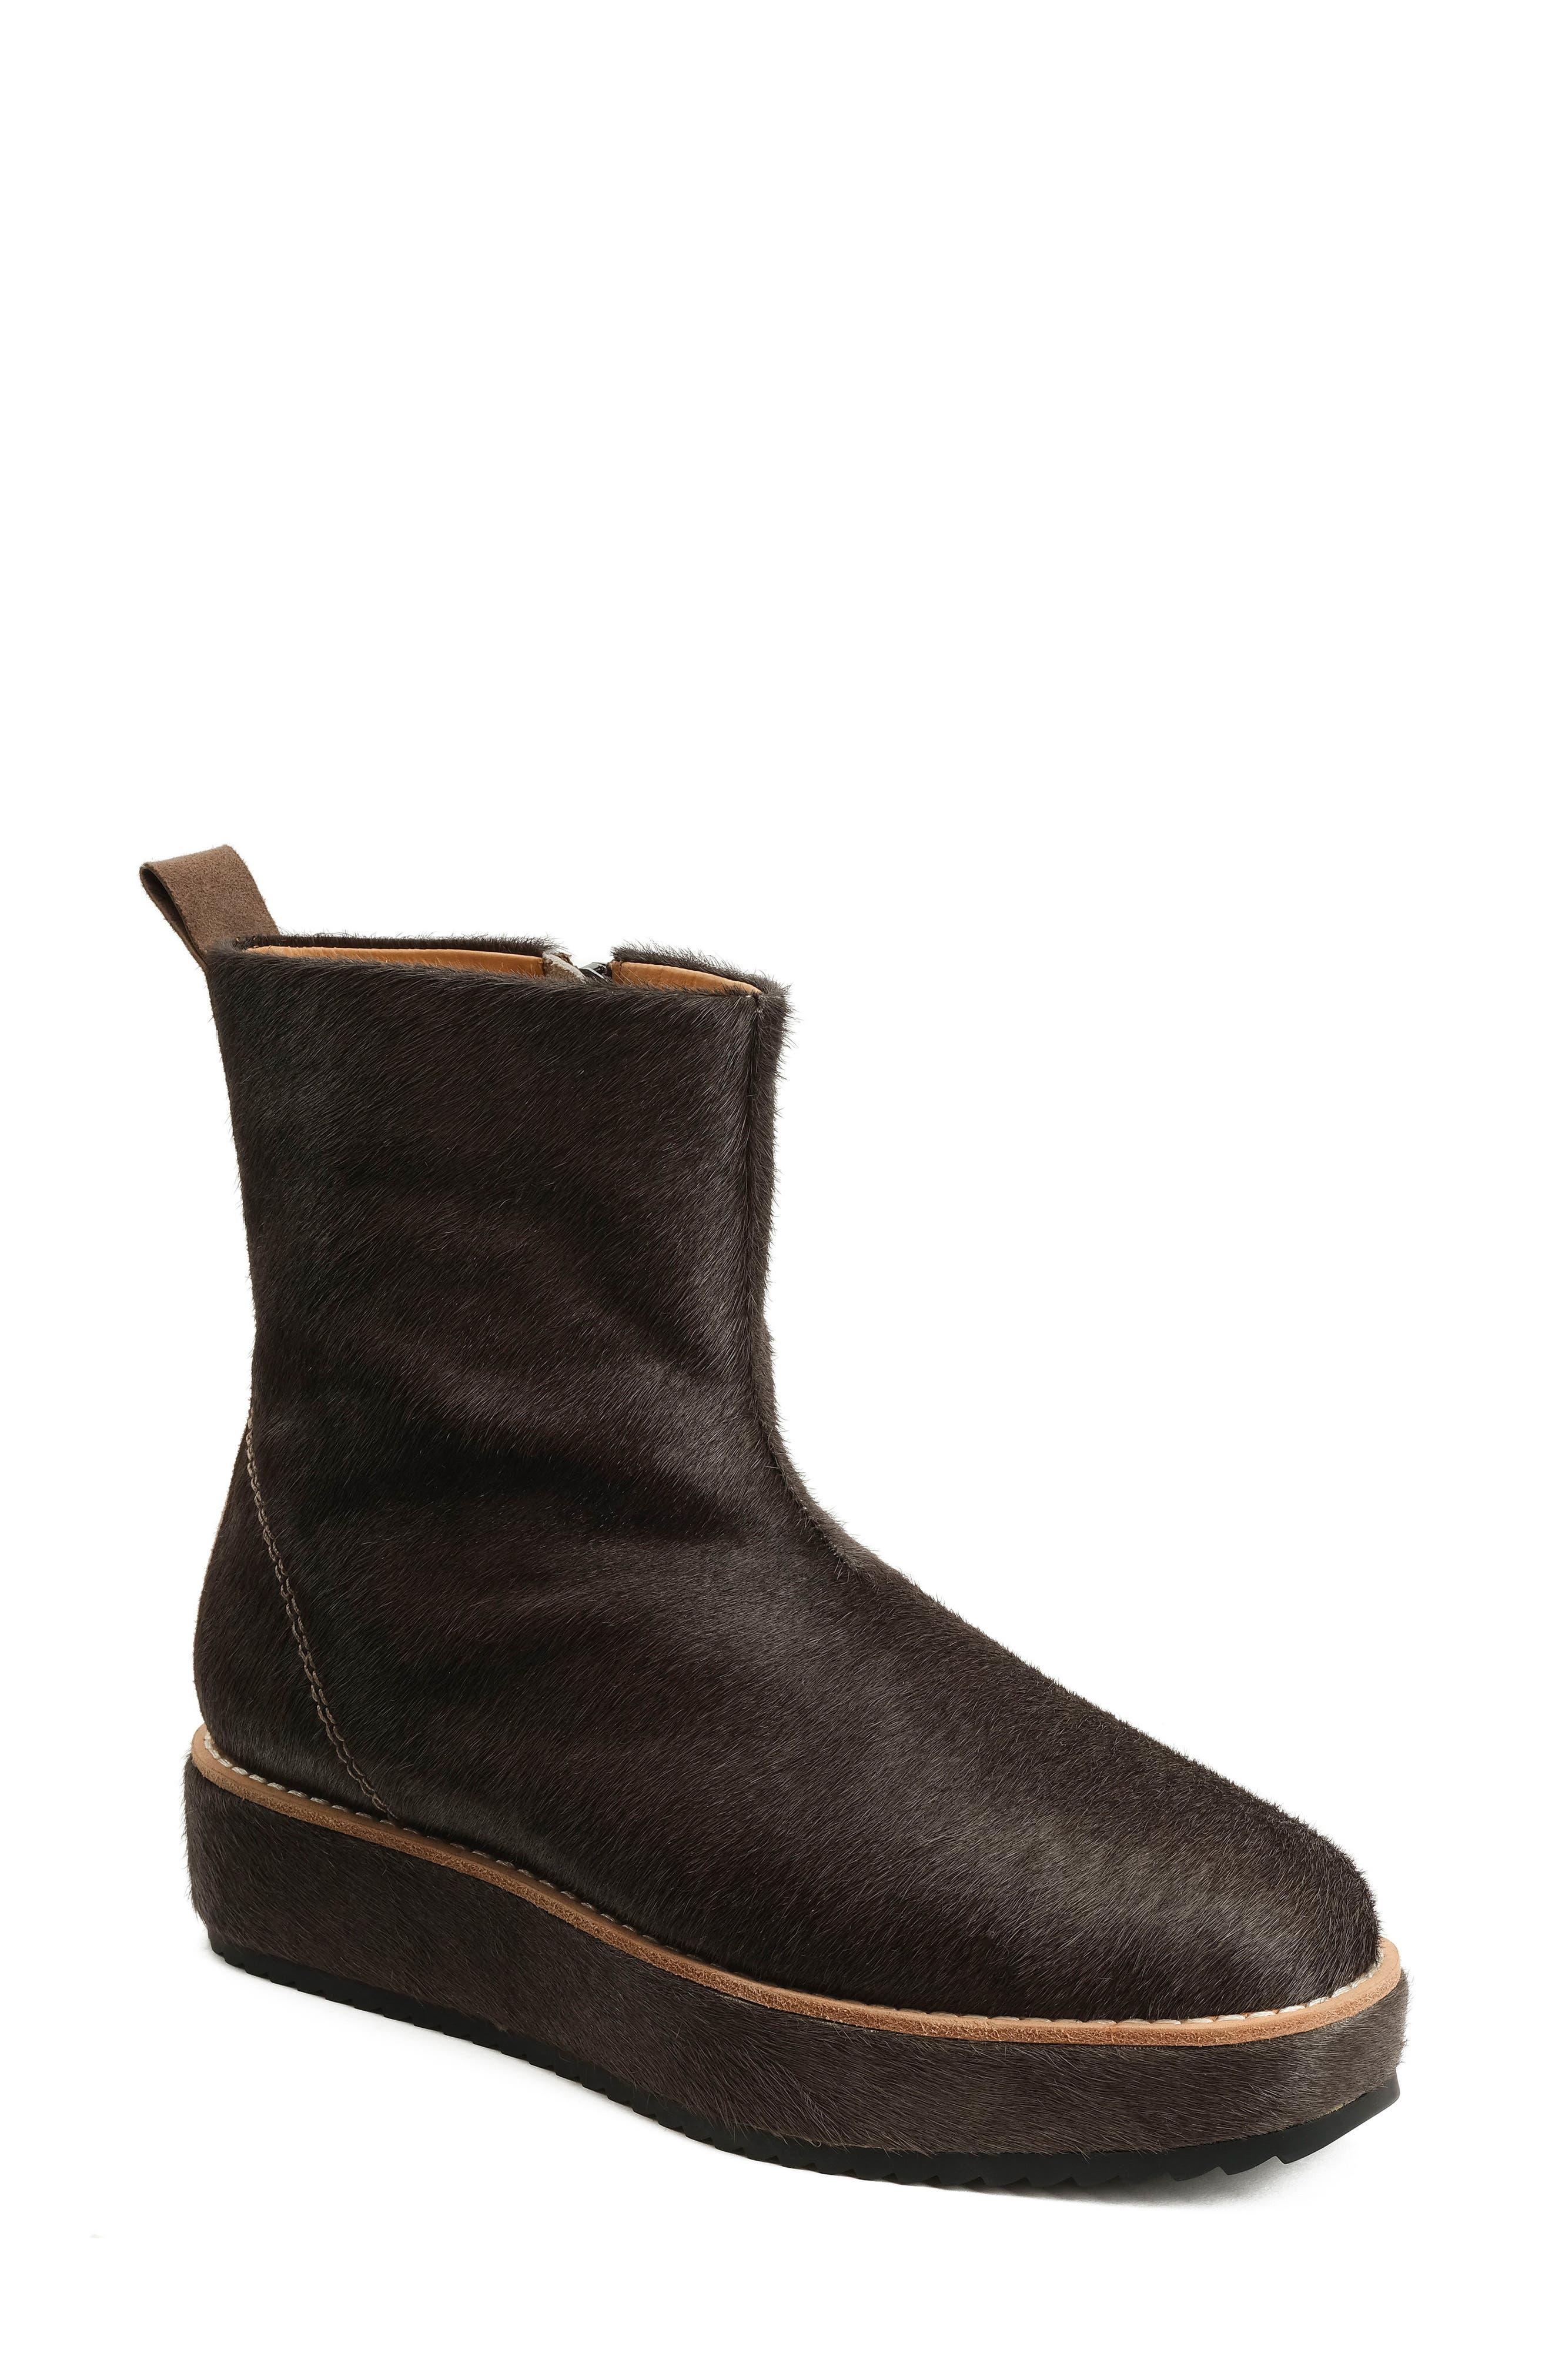 Penny Sutton Genuine Calf Hair Boot,                         Main,                         color,